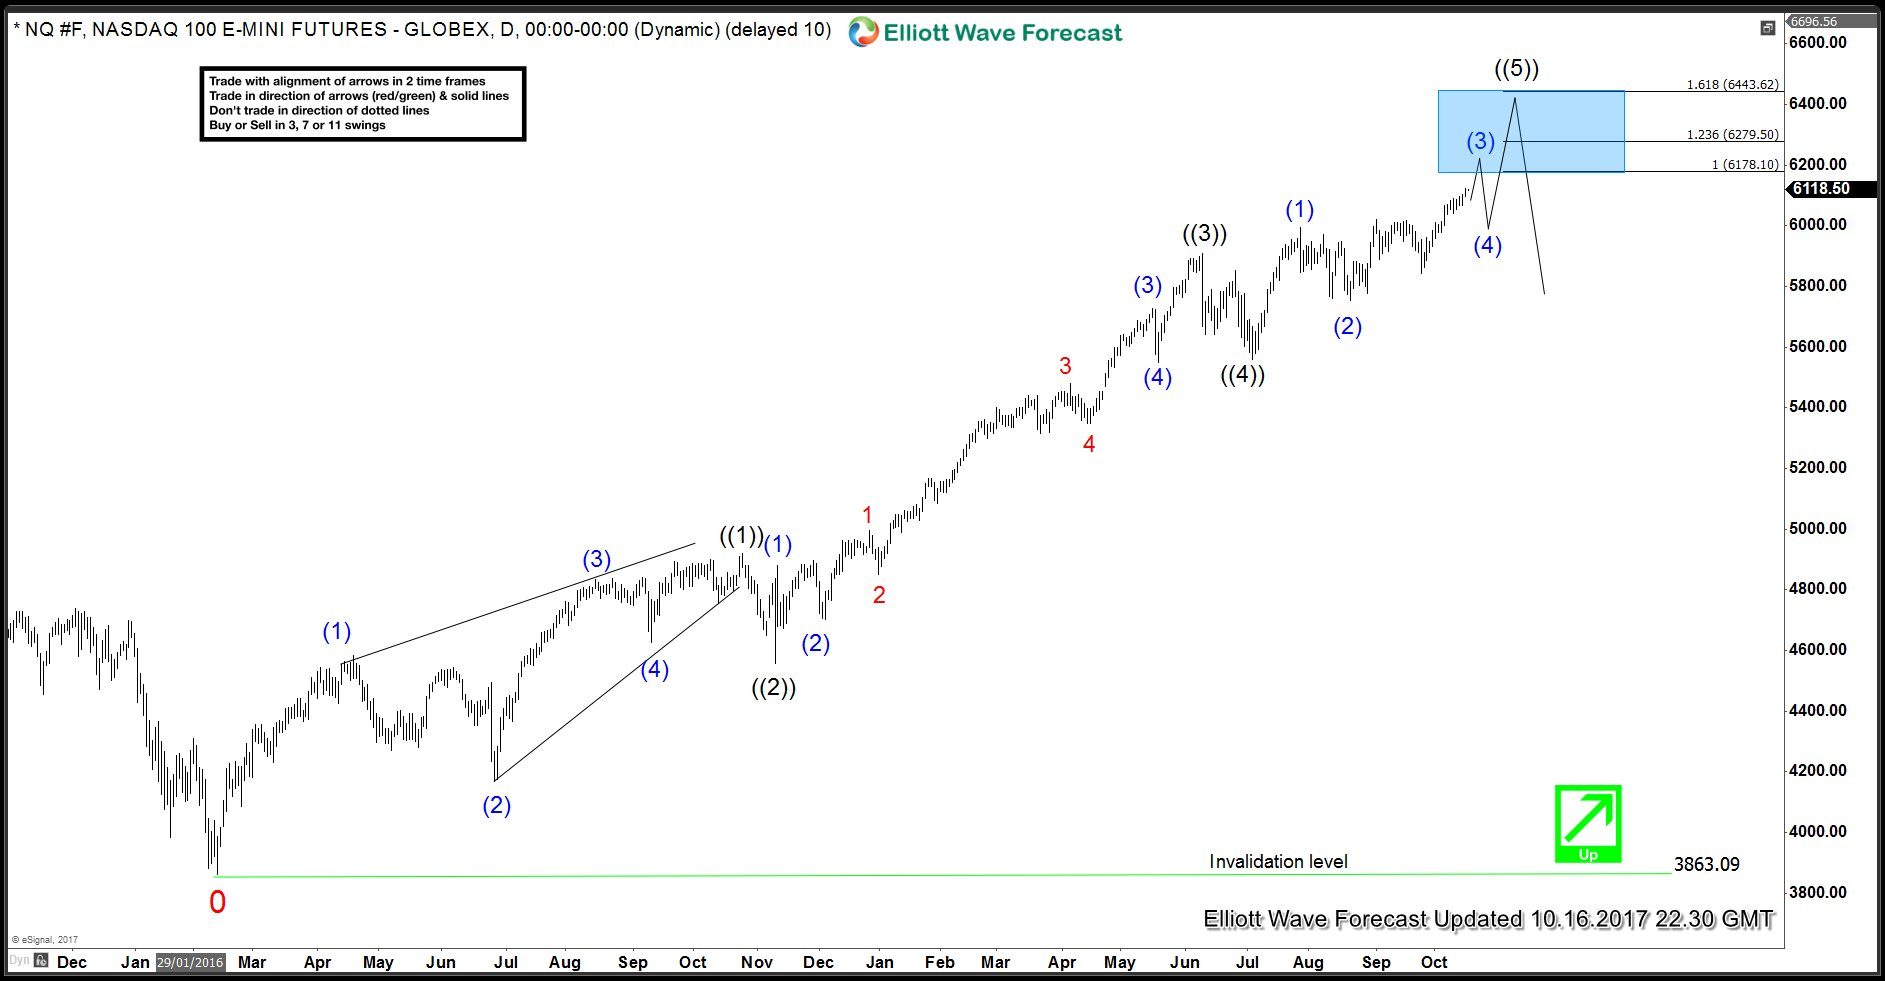 NASDAQ Futures Daily Elliott Wave Chart 10.16.2017